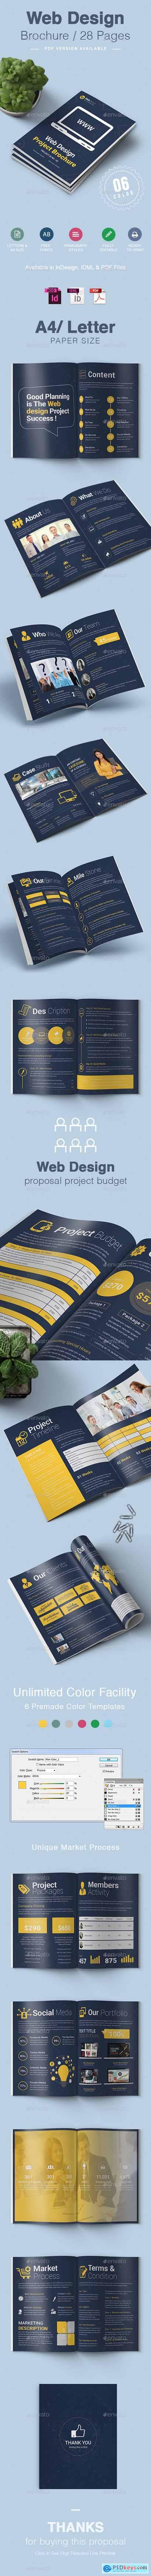 Web Design Brochure 26531500